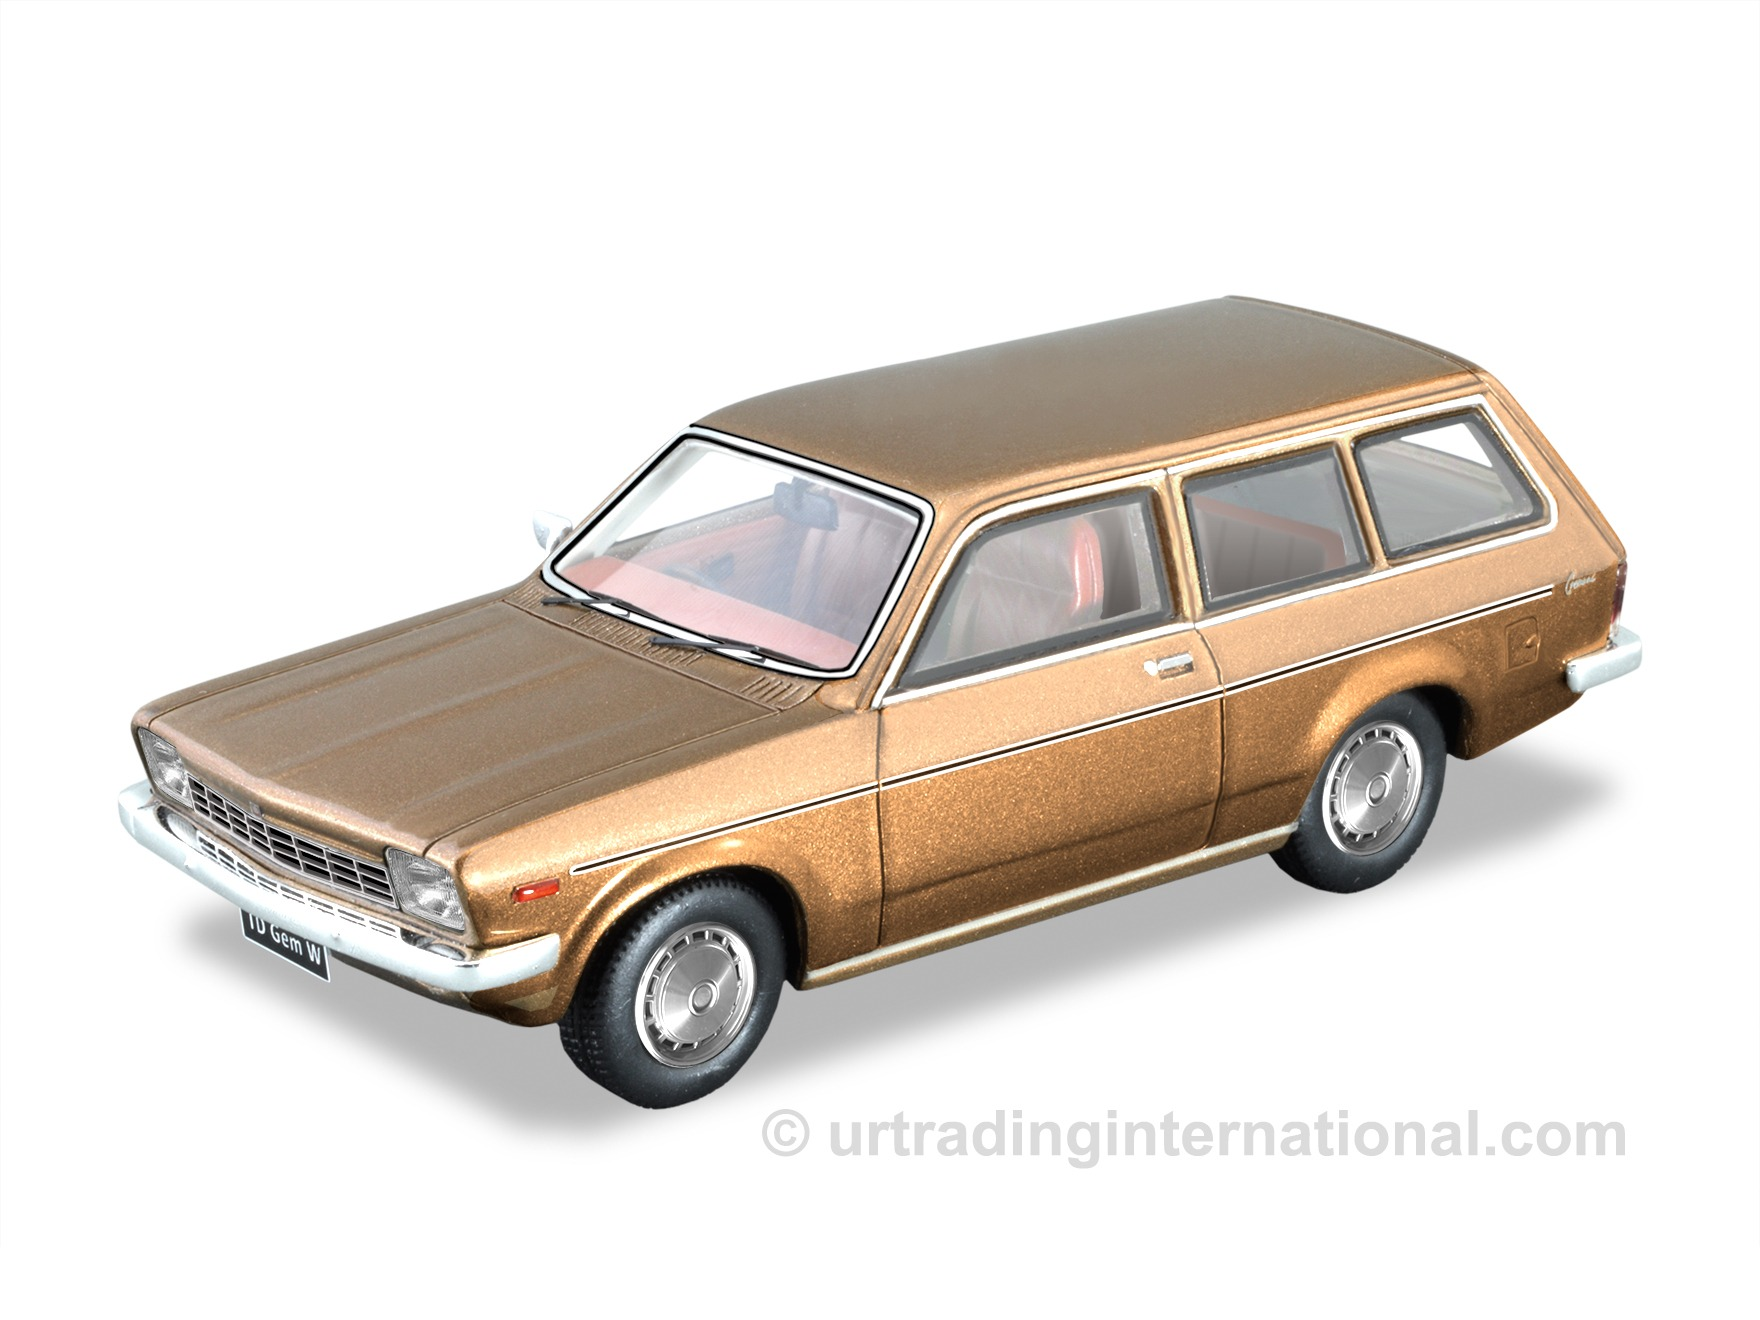 1979 TD Gemini Wagon – Gold